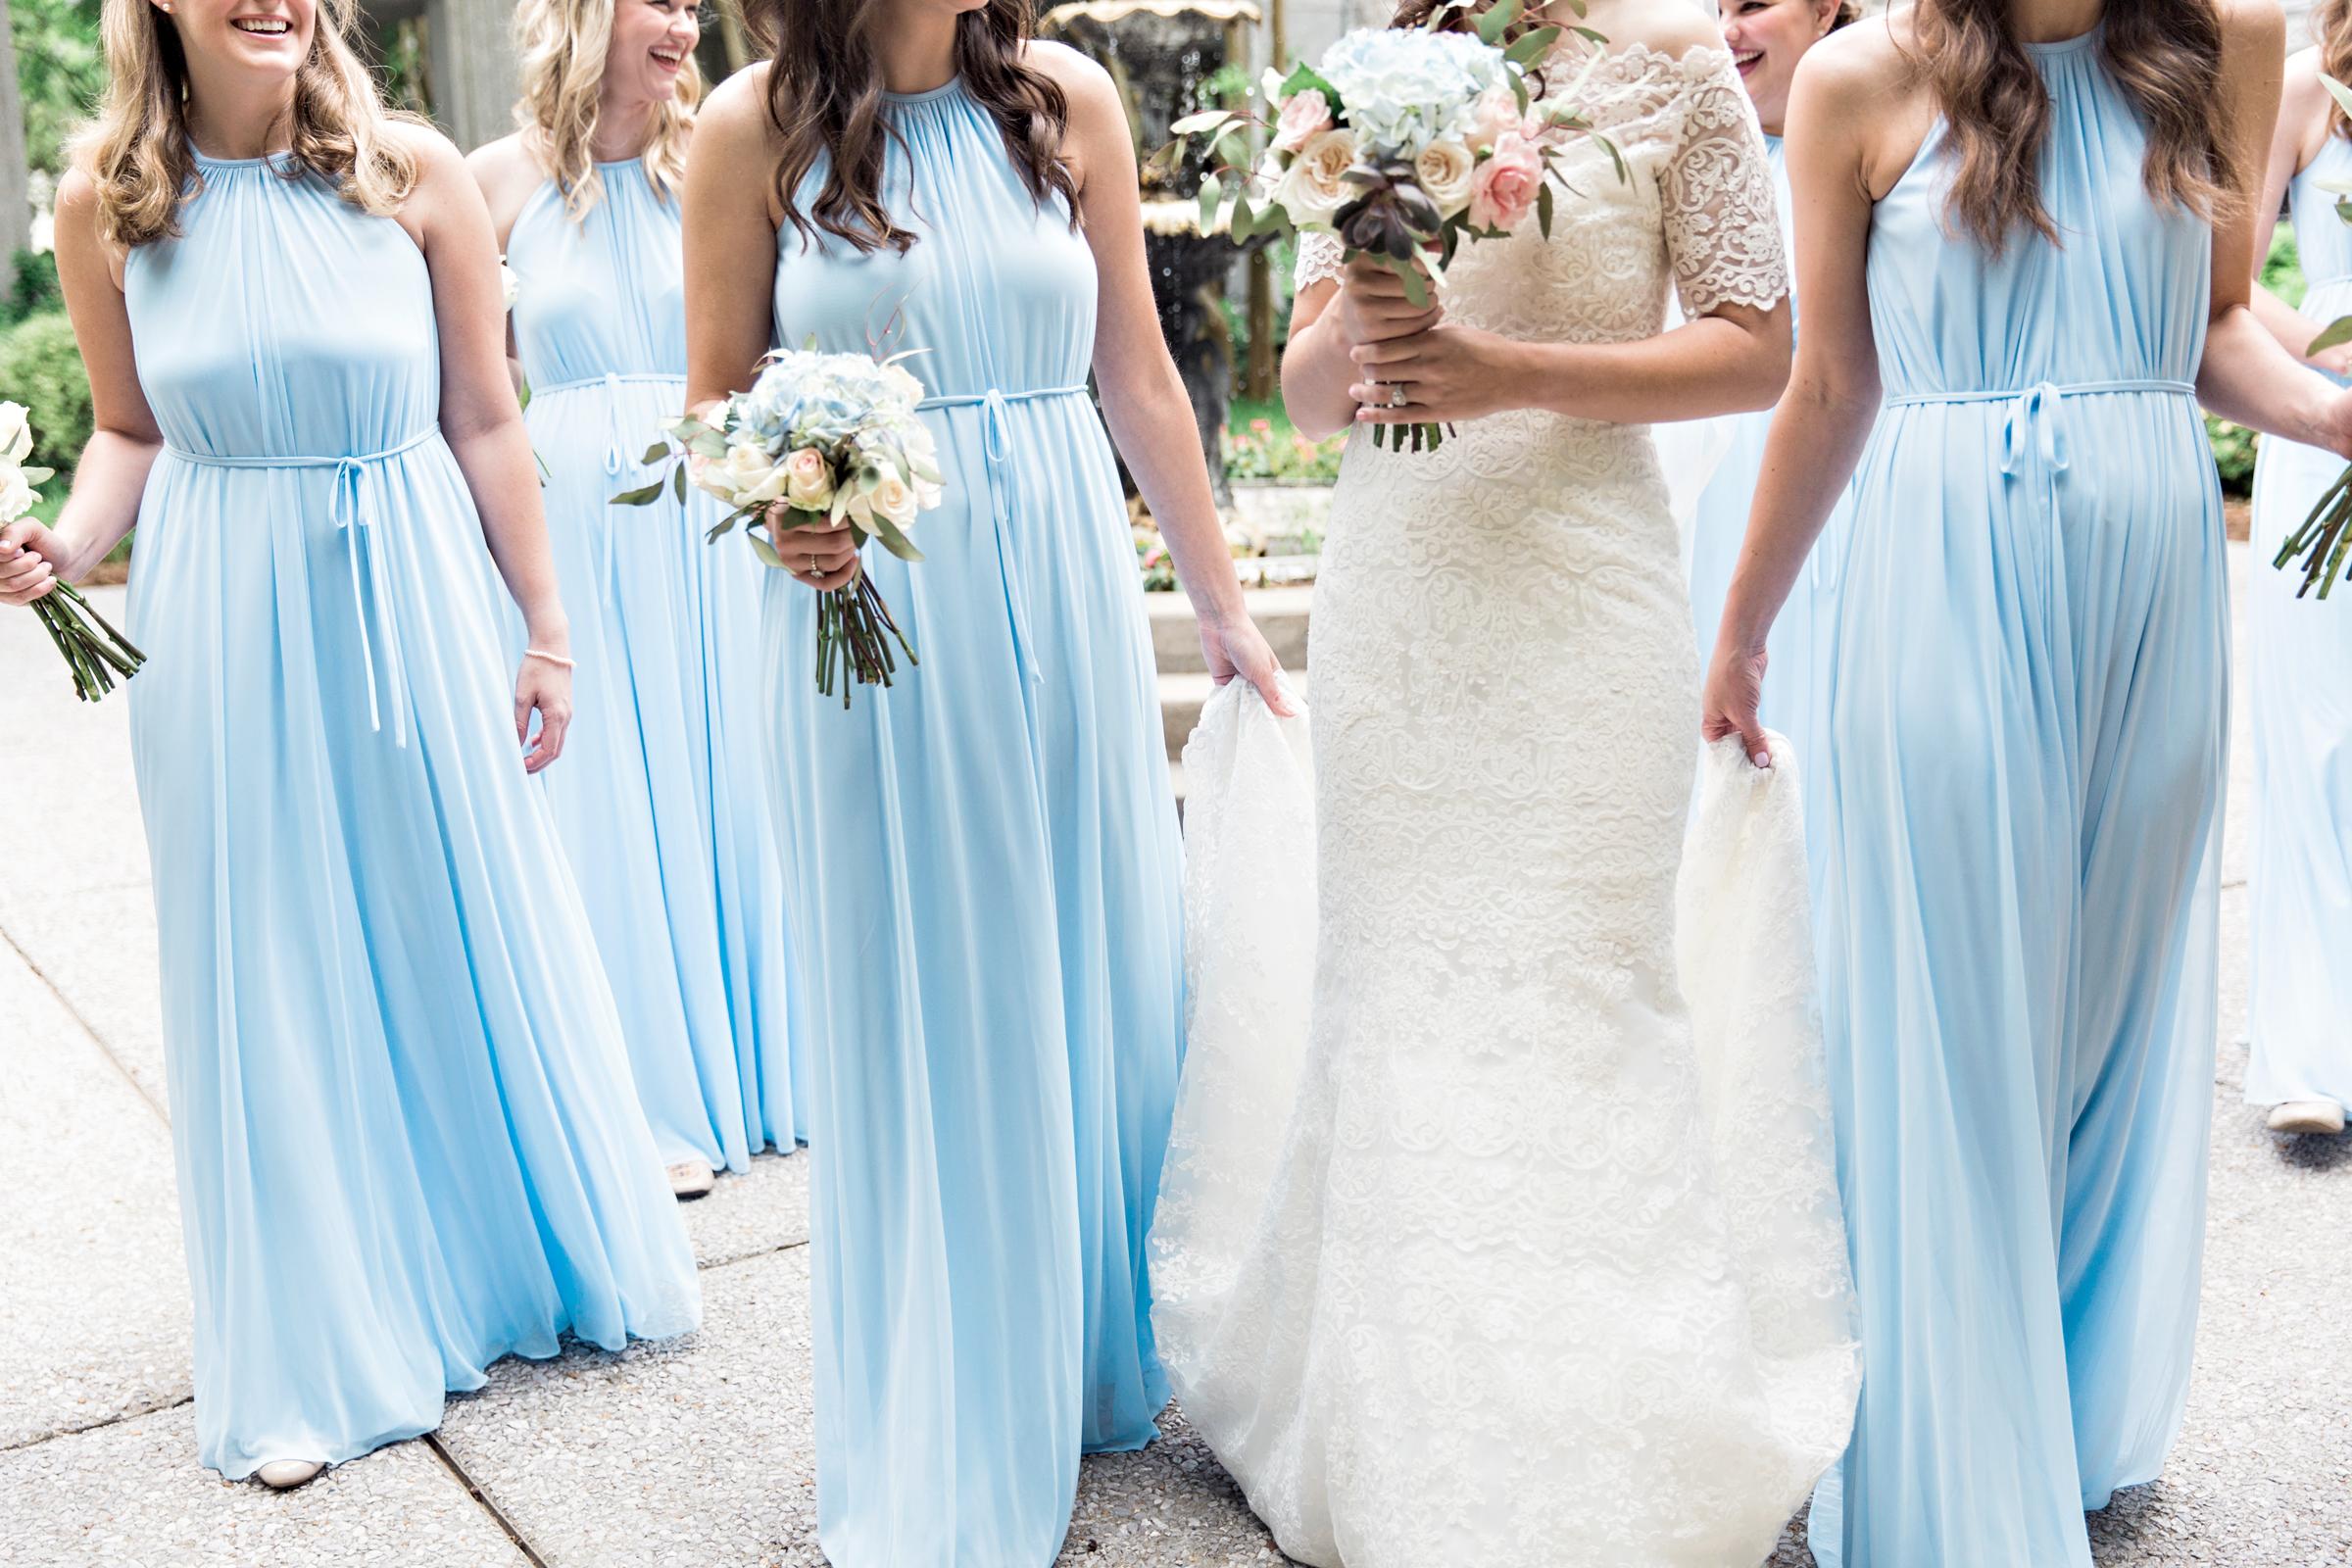 Ni ck-Drollette-Photography-Montgomery-Alabama-Weddings-116.jpg